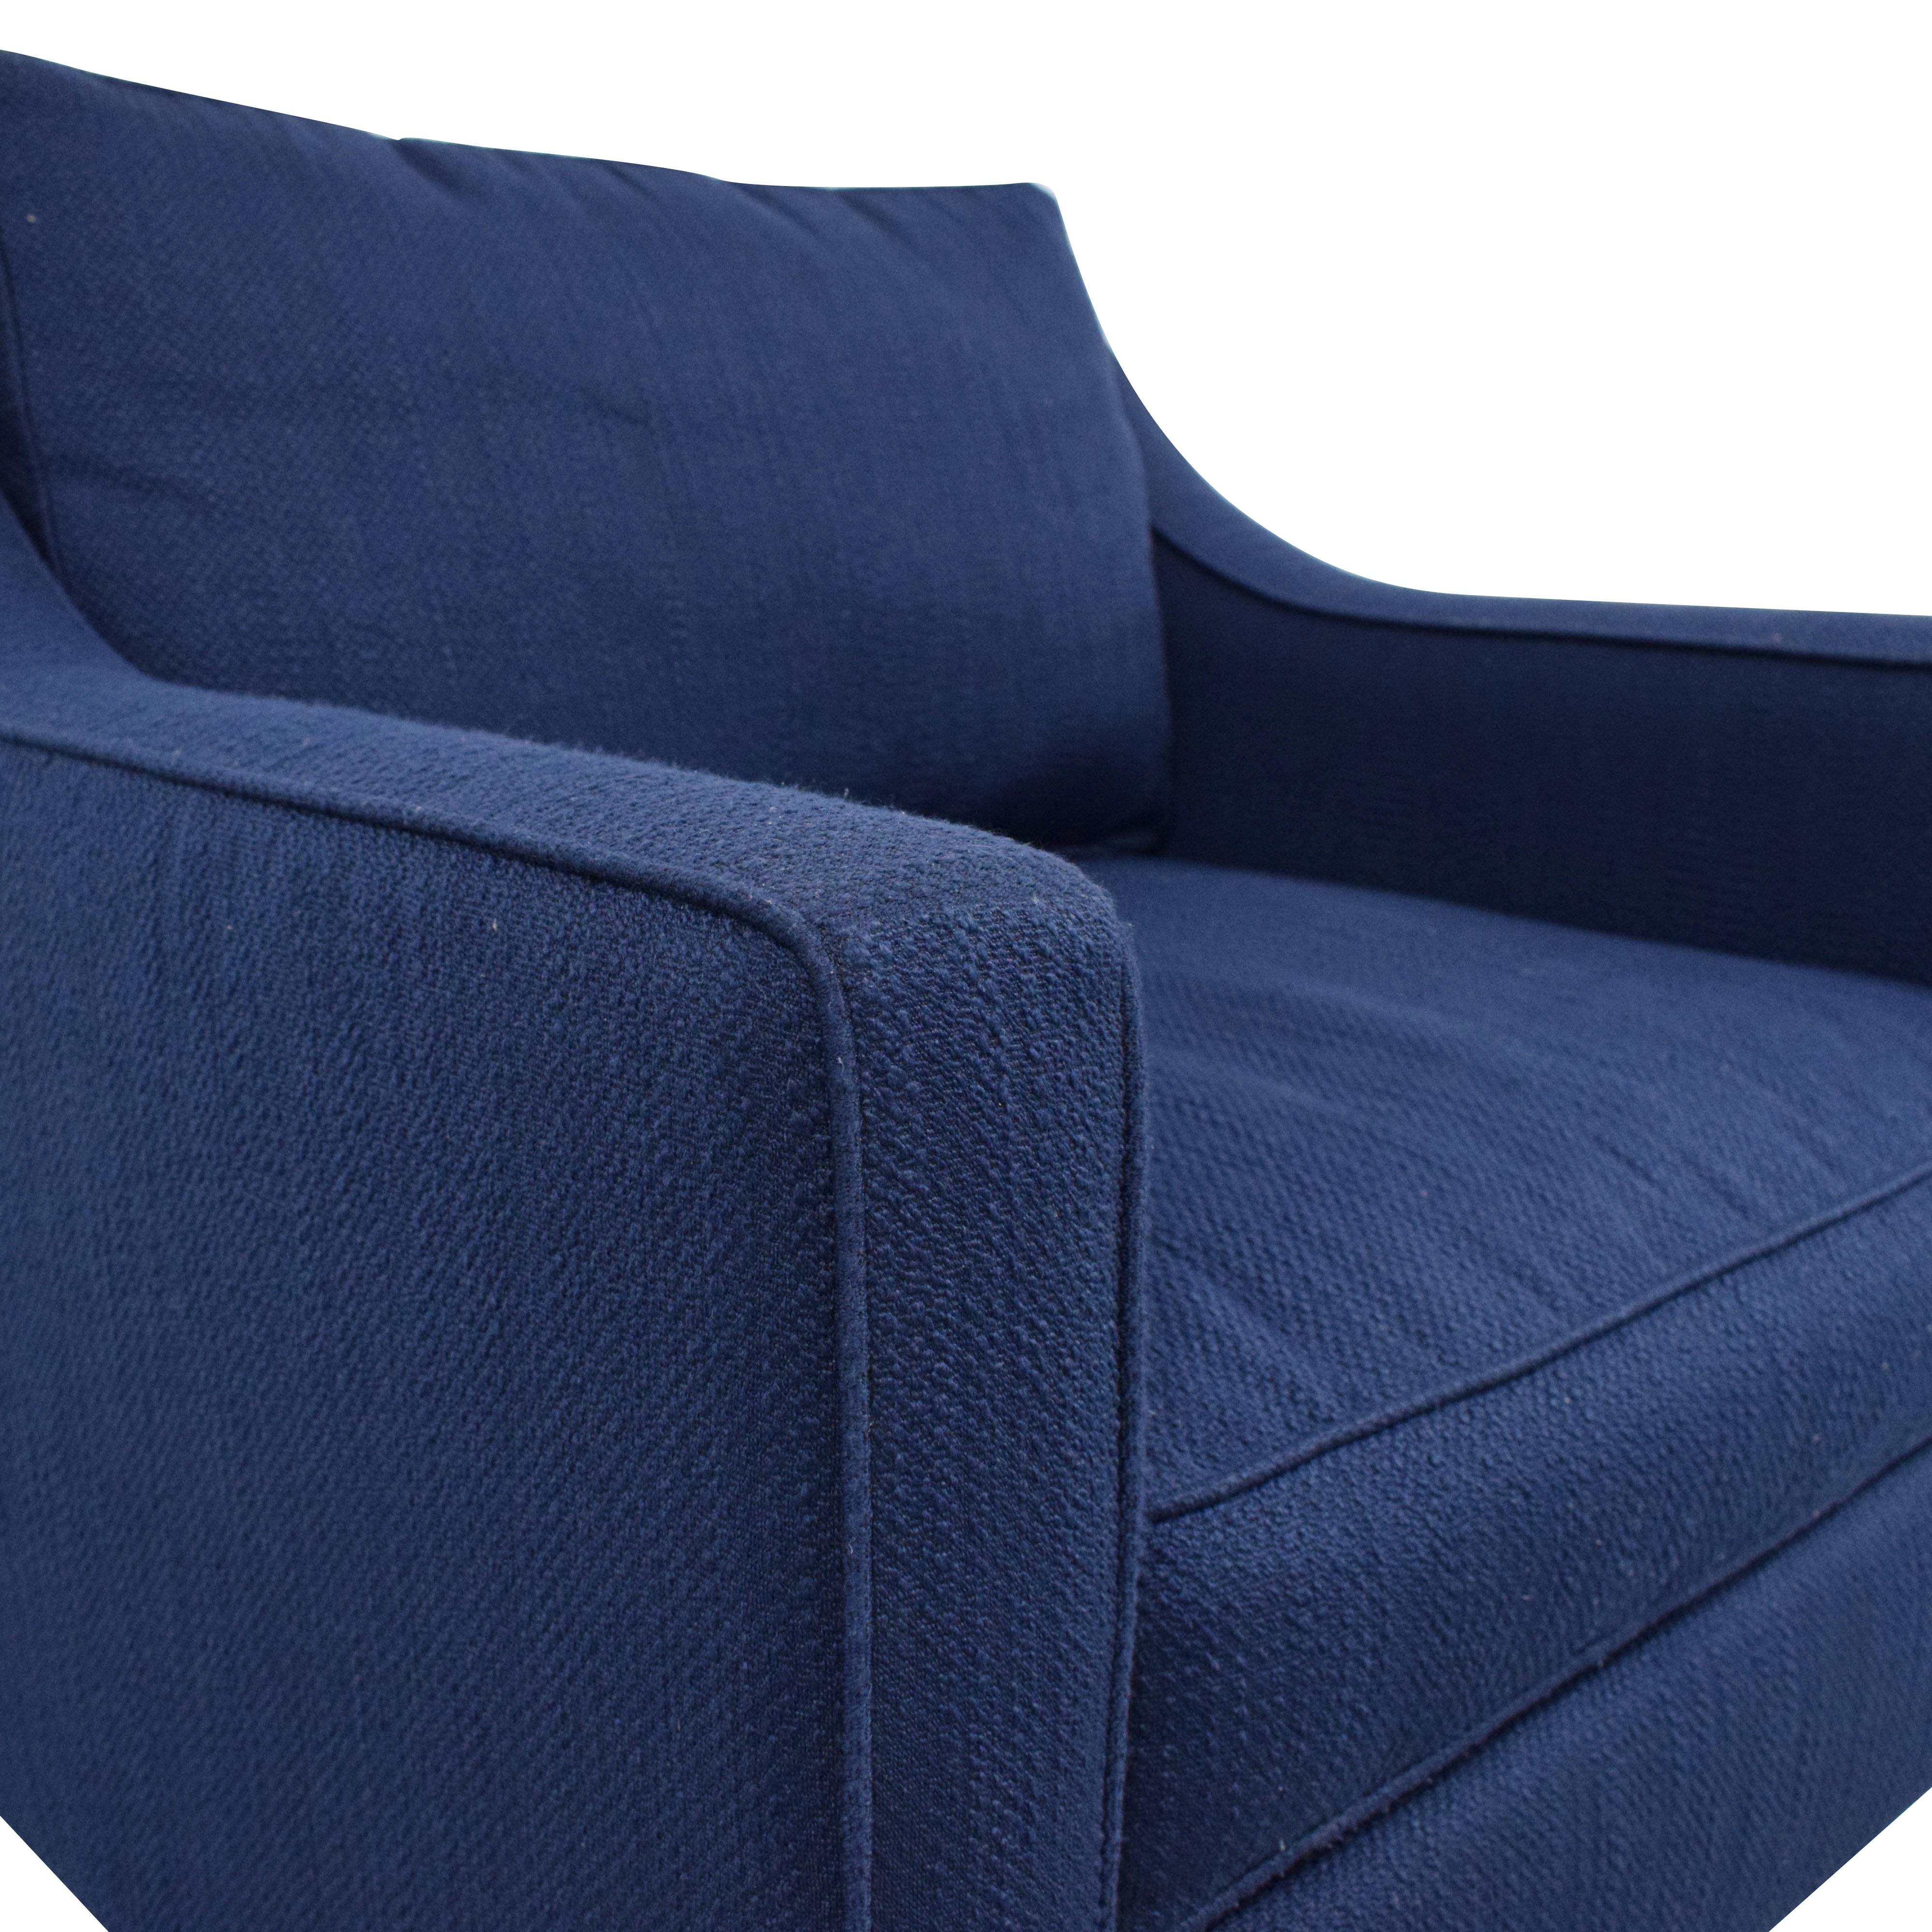 West Elm West Elm Paidge Chair used